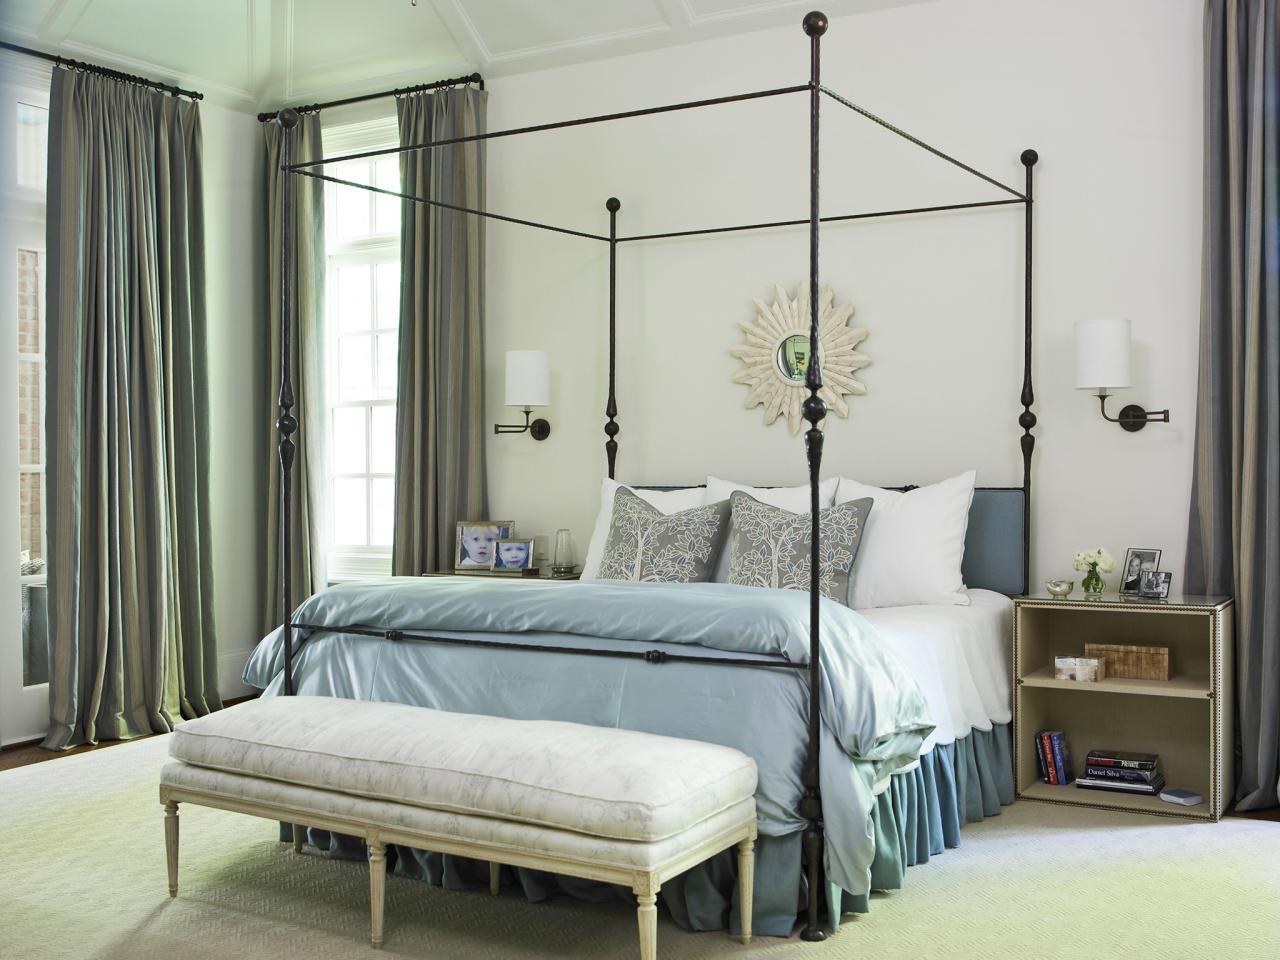 9 Nightstand Alternatives for Small Bedrooms | HGTV's Decorating & Design  Blog | HGTV - 9 Nightstand Alternatives For Small Bedrooms HGTV's Decorating